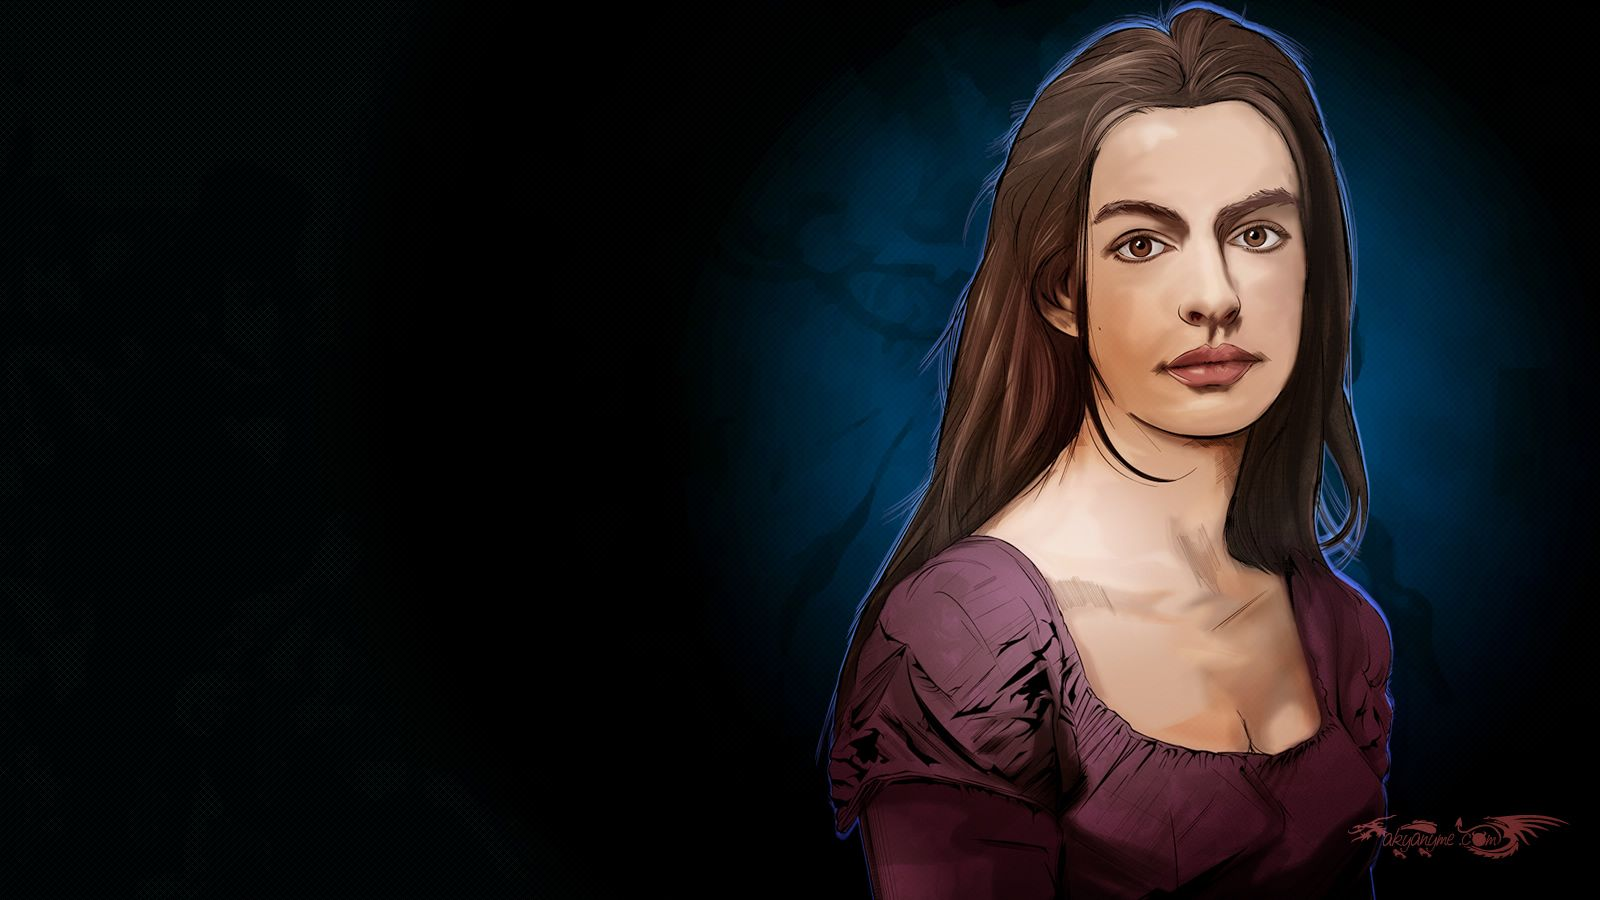 I Dreamed A Dream Anne Hathaway By Akyanyme Deviantart Com On